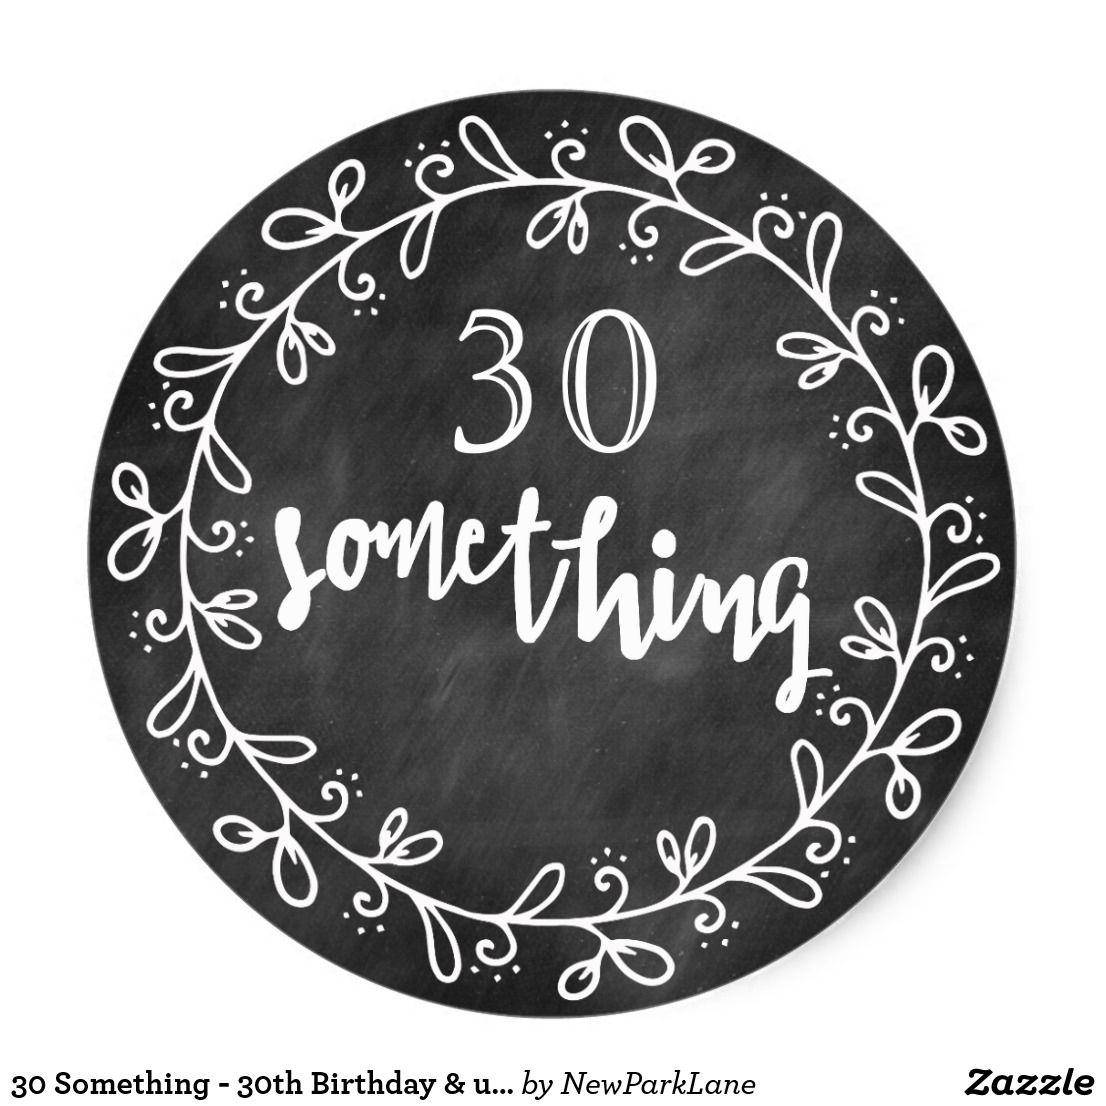 30 something 30th birthday up custom stickers f i for your party favor bags 30 thirtiethbirthday birthday thirtysomething blackandwhite